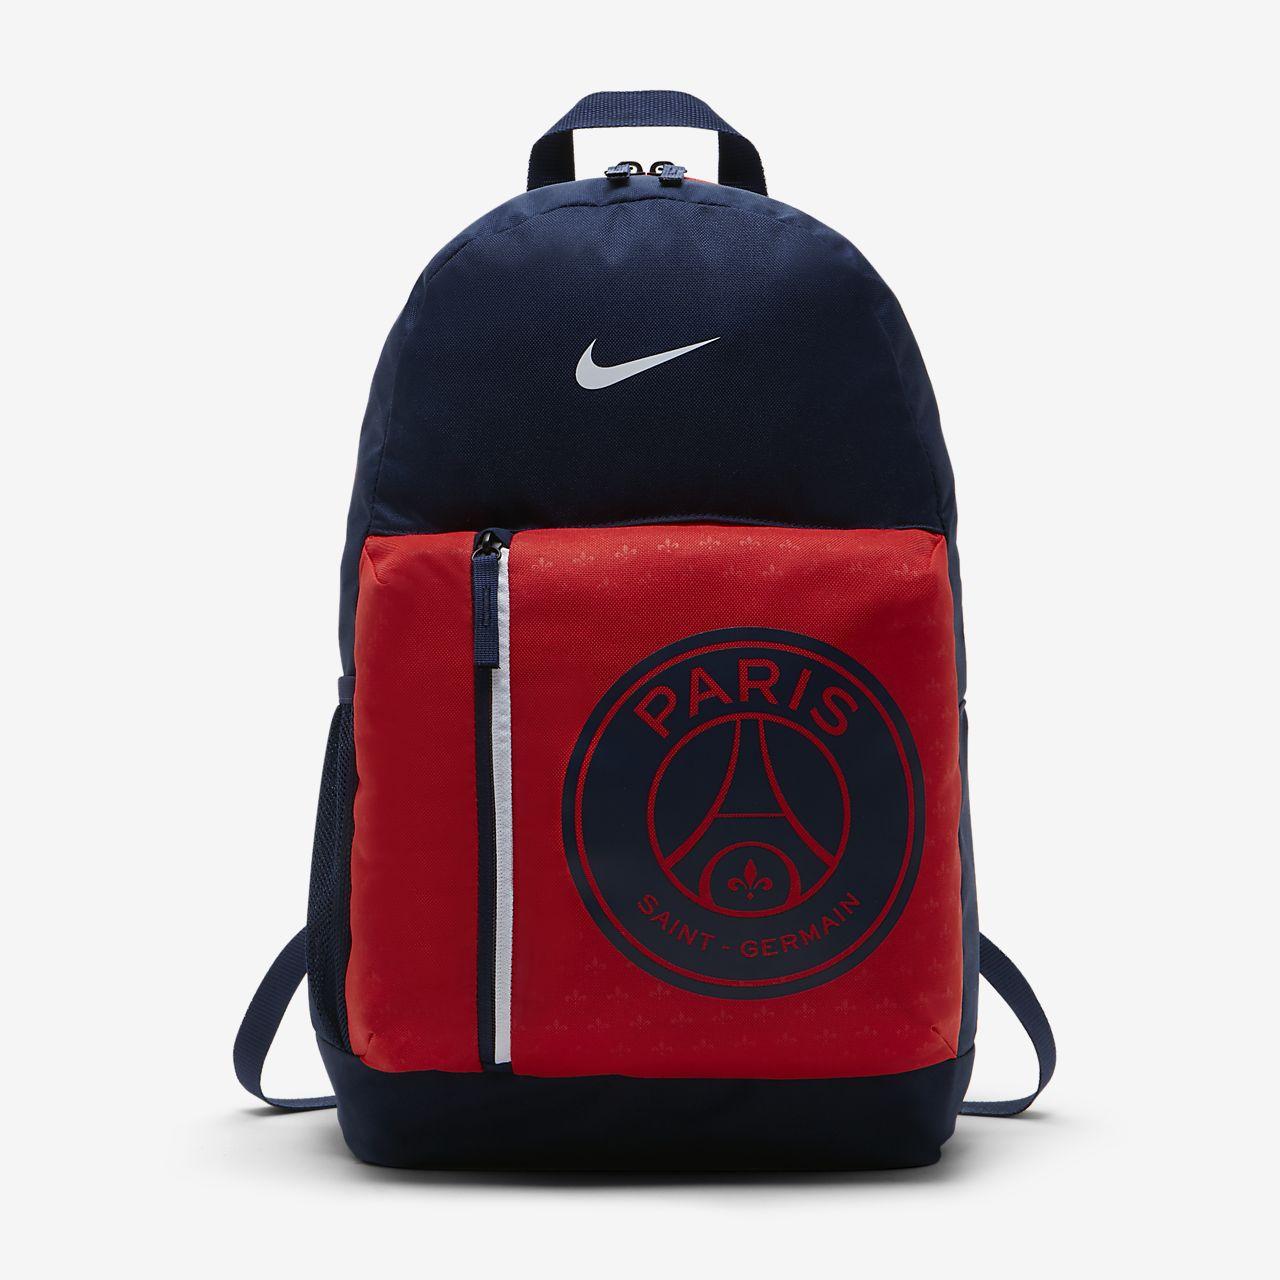 hot sale online c329e e1726 Mochila de fútbol para niños Paris Saint-Germain Stadium